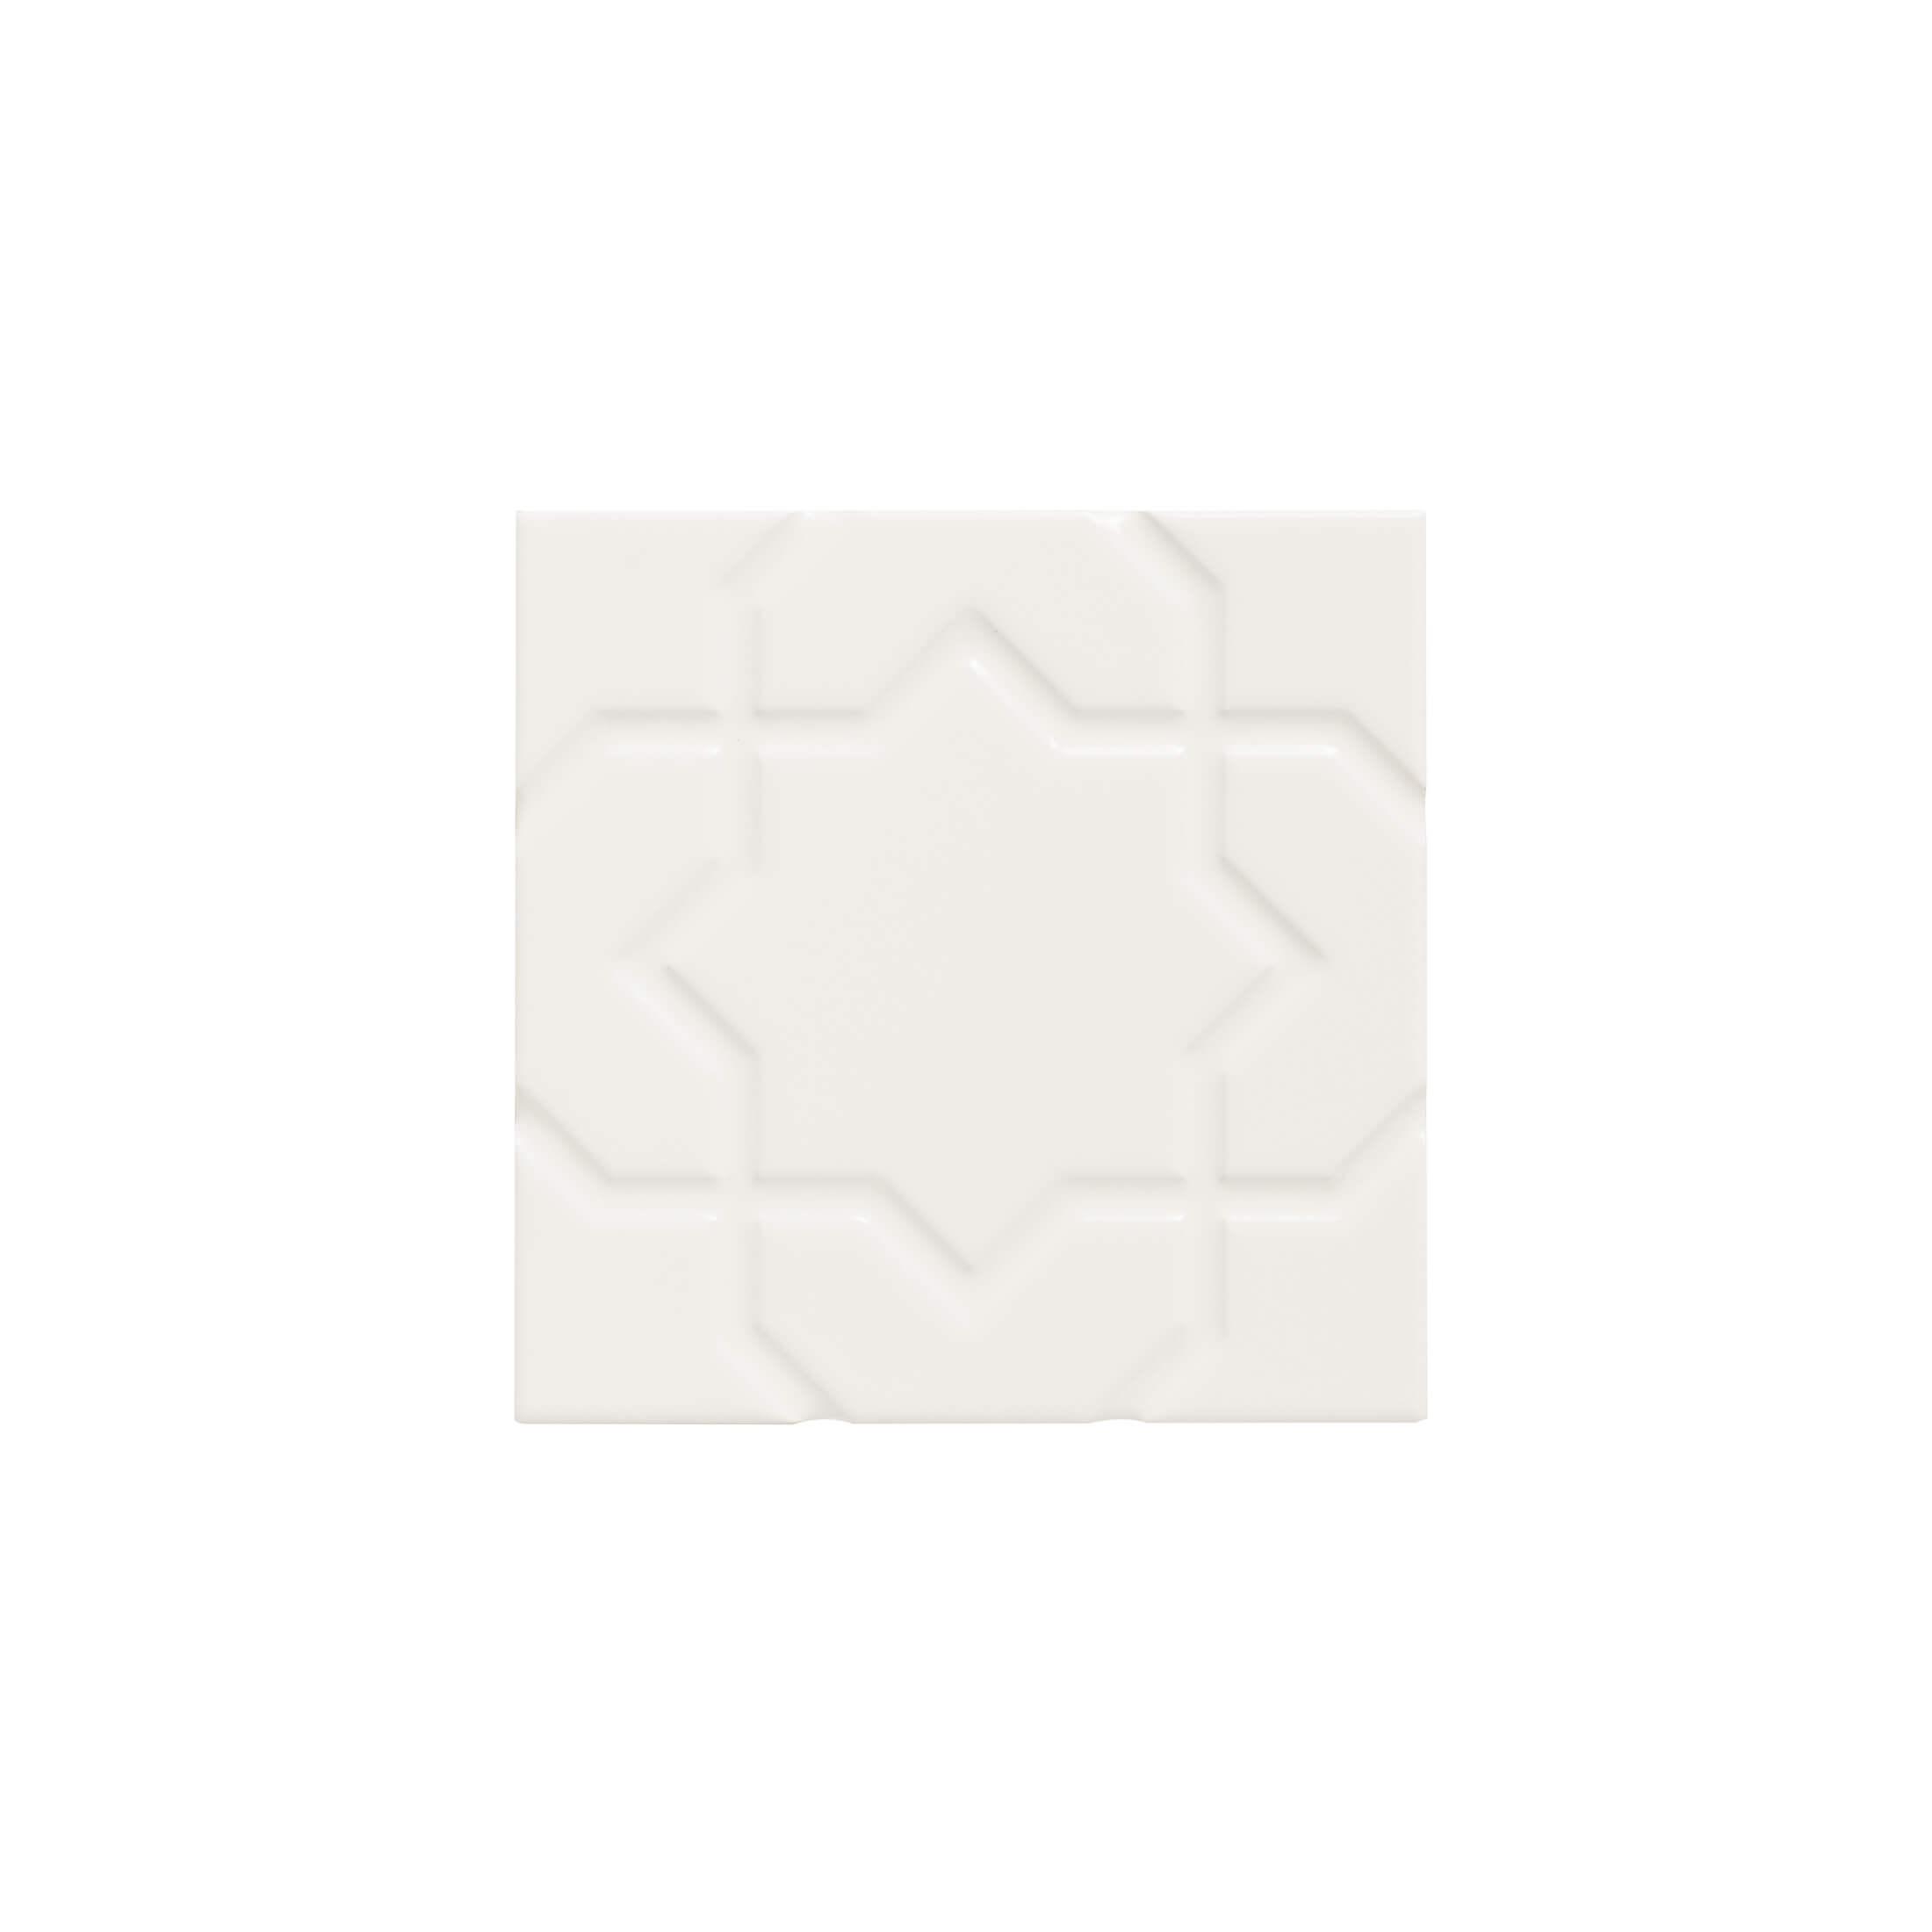 ADNE4152 - LISO STAR - 15 cm X 15 cm